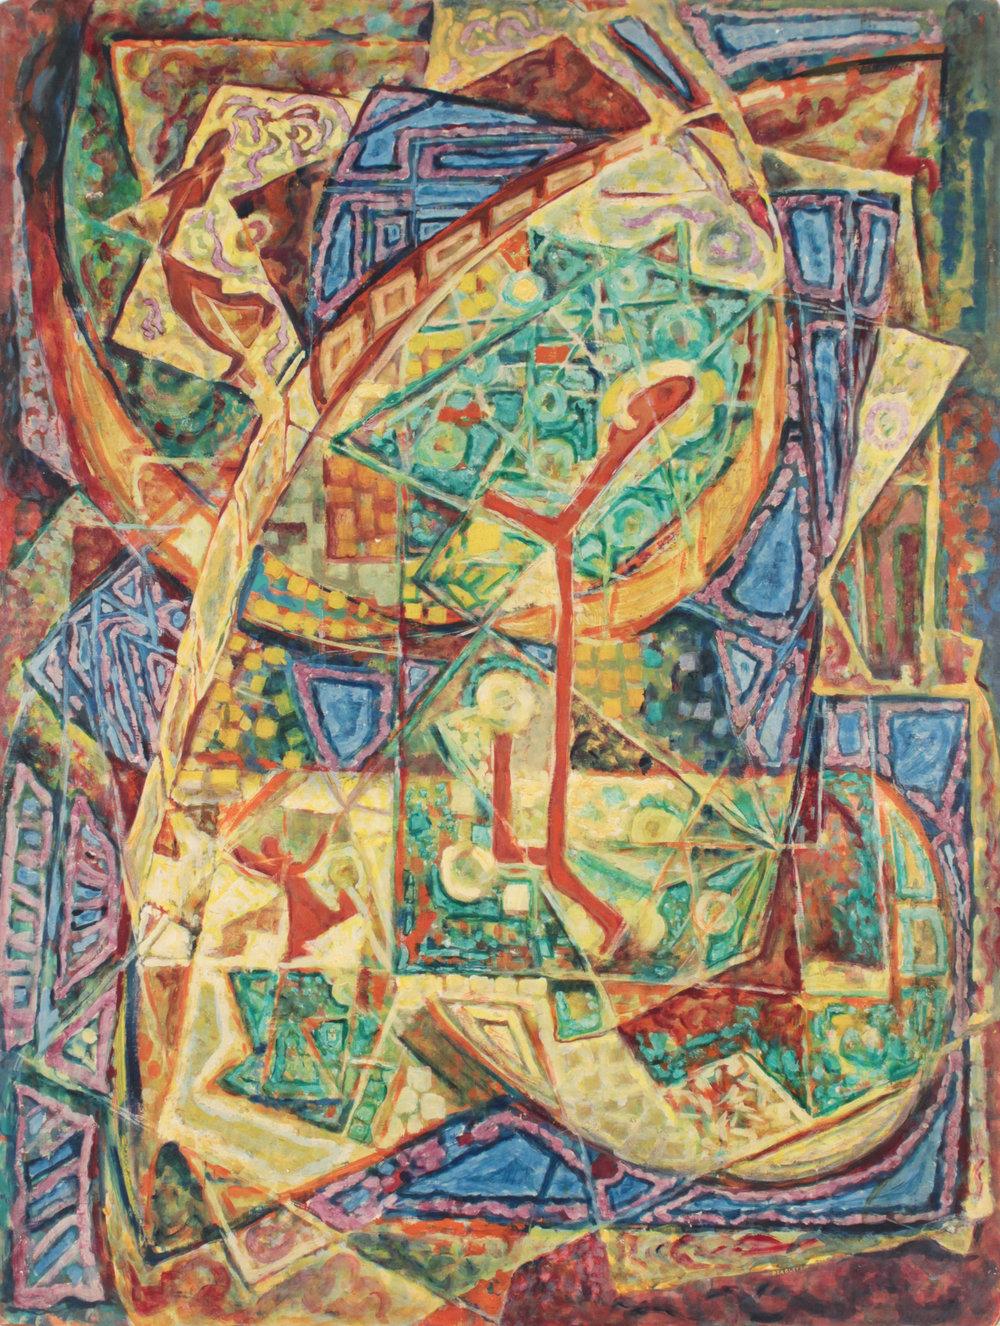 29. 1948-49 c, Ode to Joy, Casein on Masonite, 40x30, PPS 1571.JPG